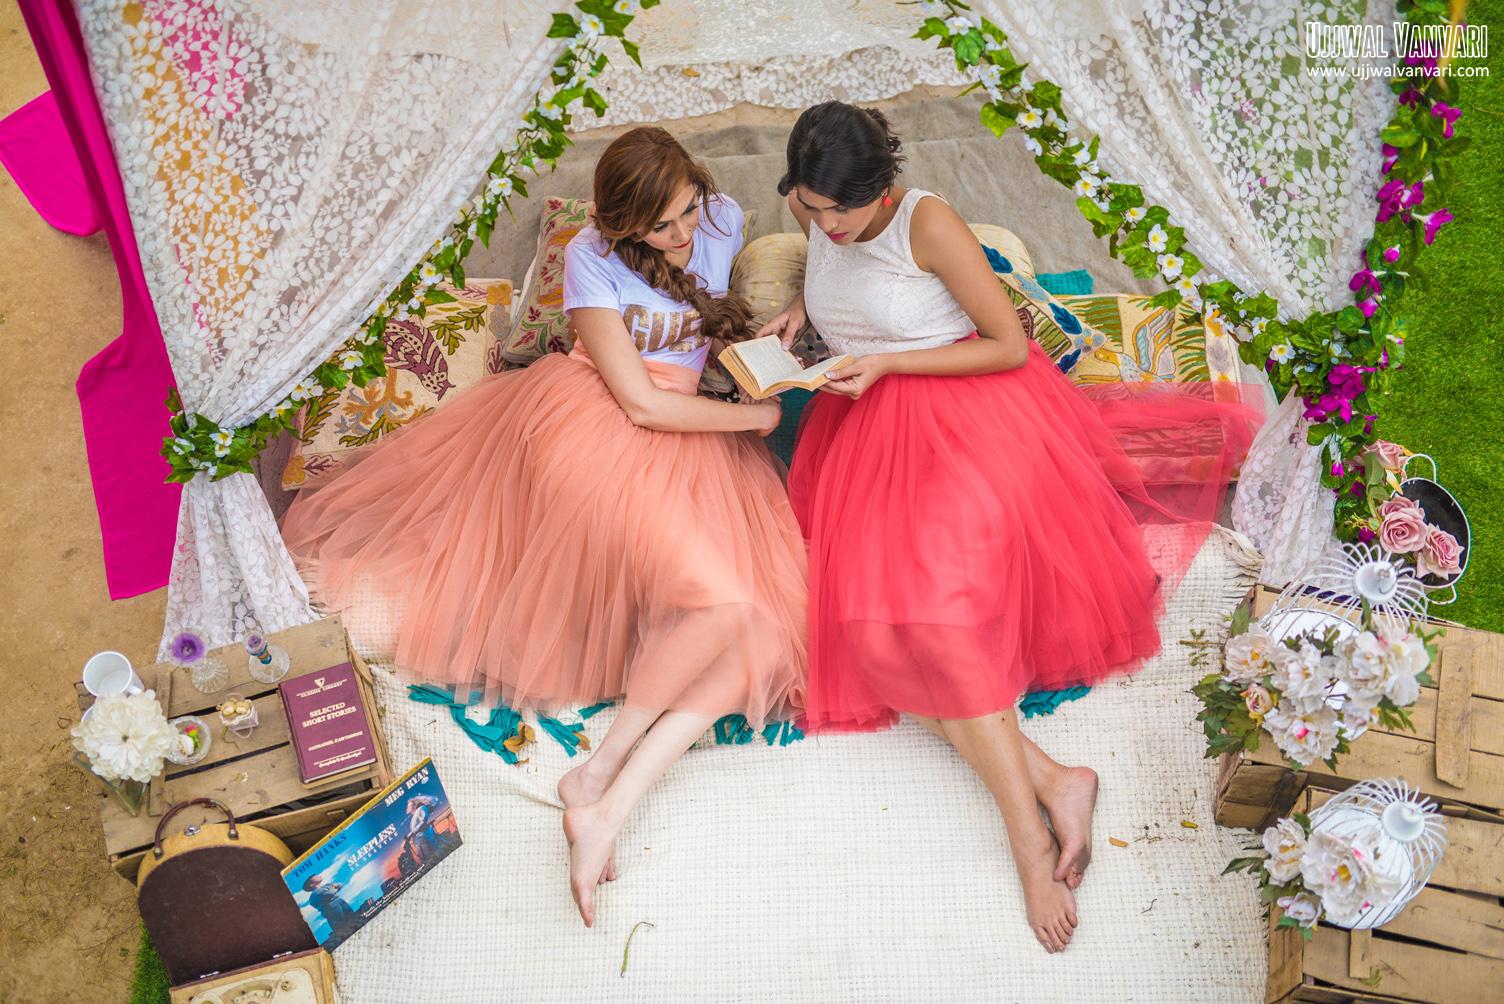 fashion photography | the perfect location | dixika vanvari withlovemissd | ashima makhija colorsnglitters